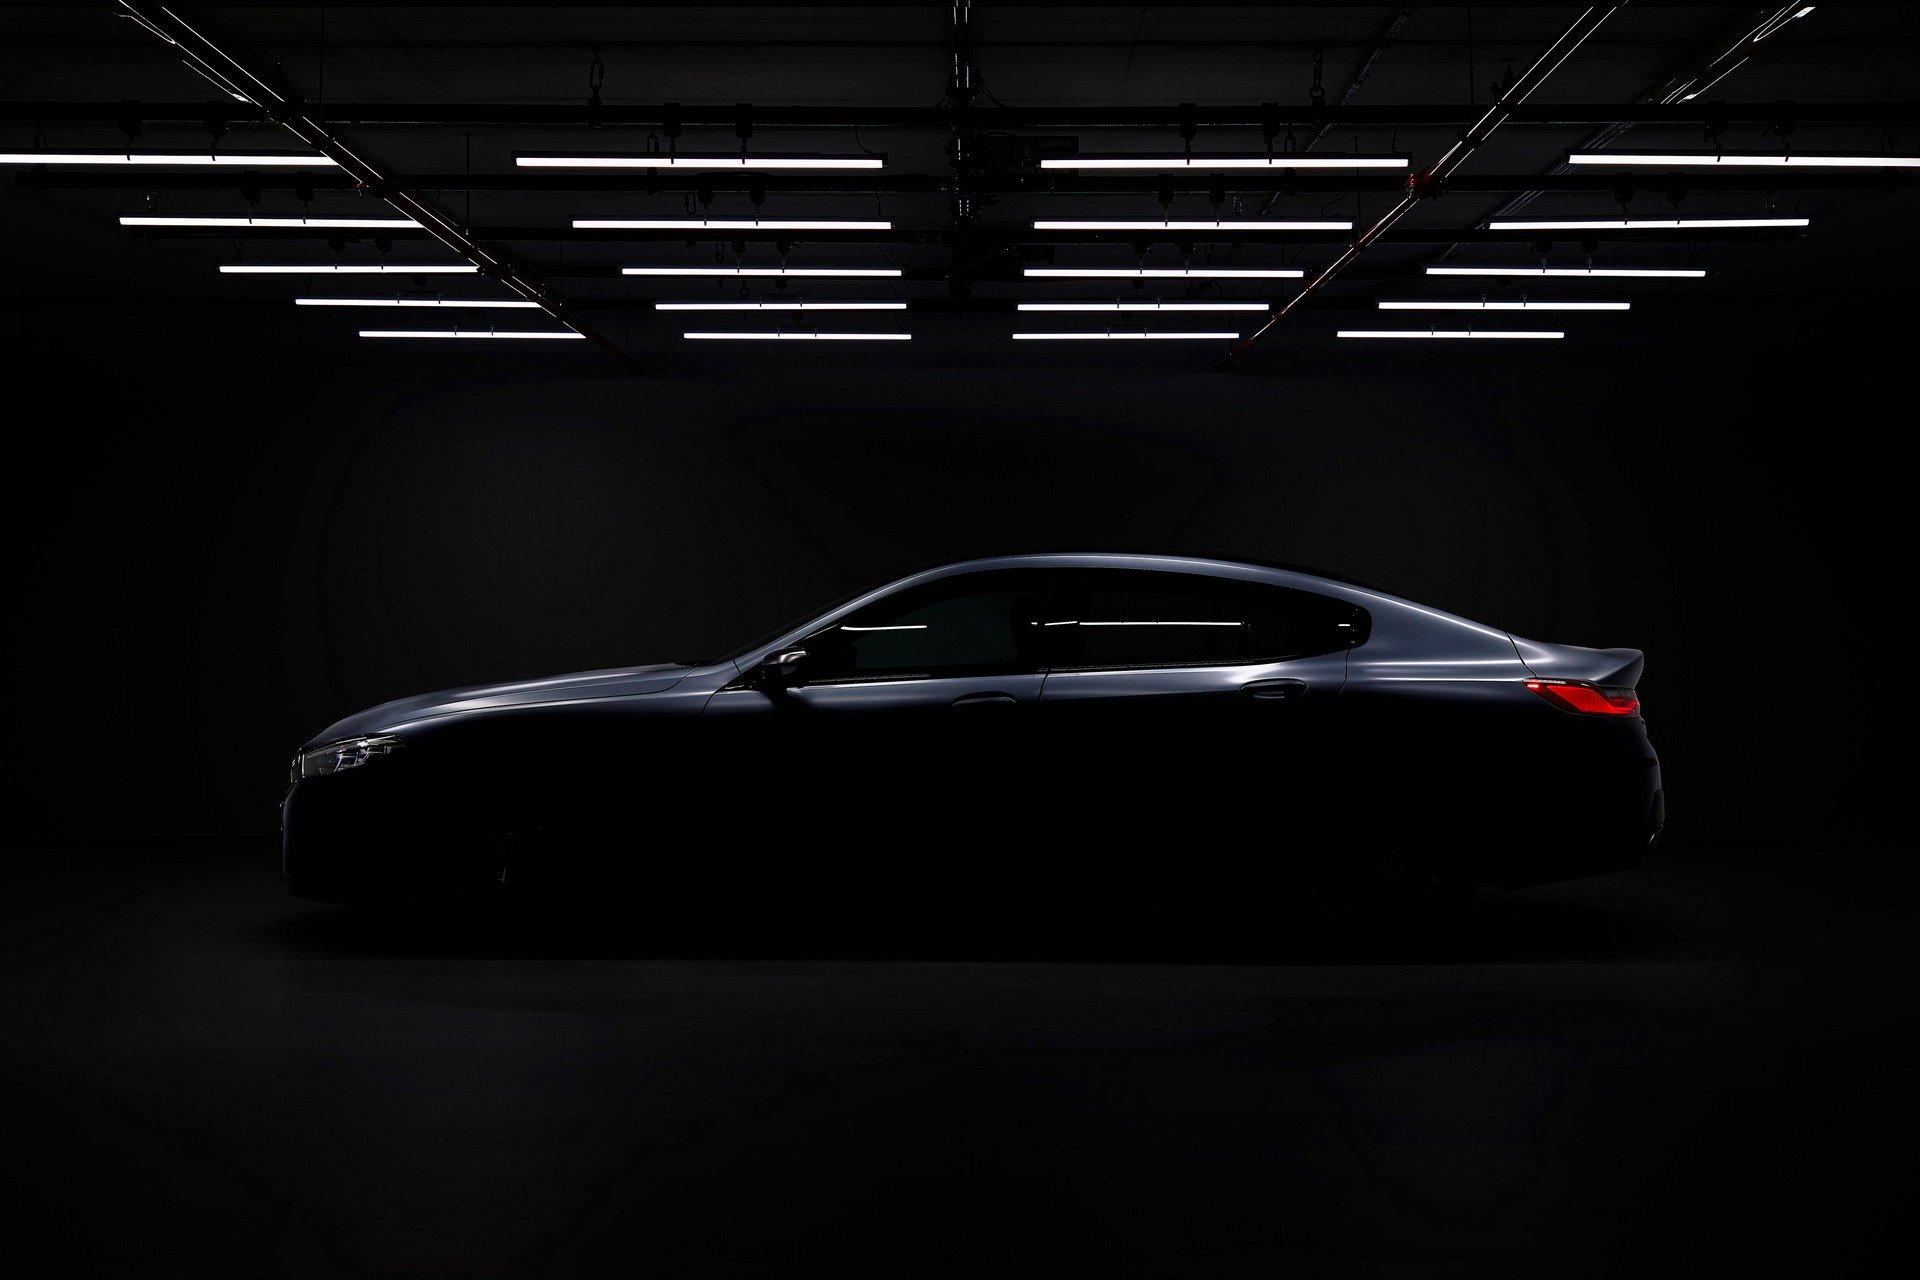 361adeb2-2020-bmw-8-series-gran-coupe-3